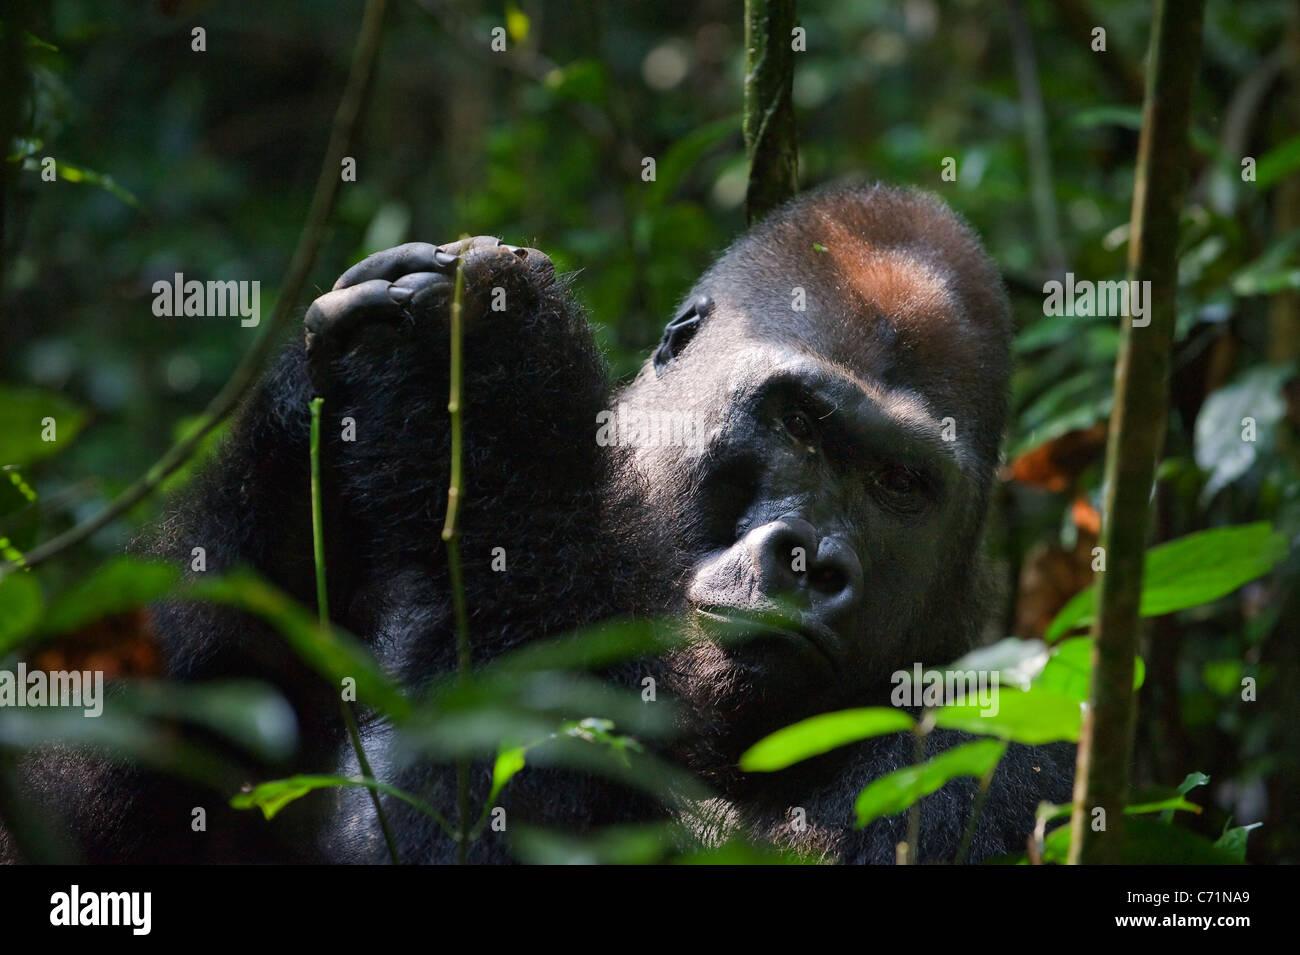 Silverback - adult male of a gorilla.Western Lowland Gorilla. - Stock Image